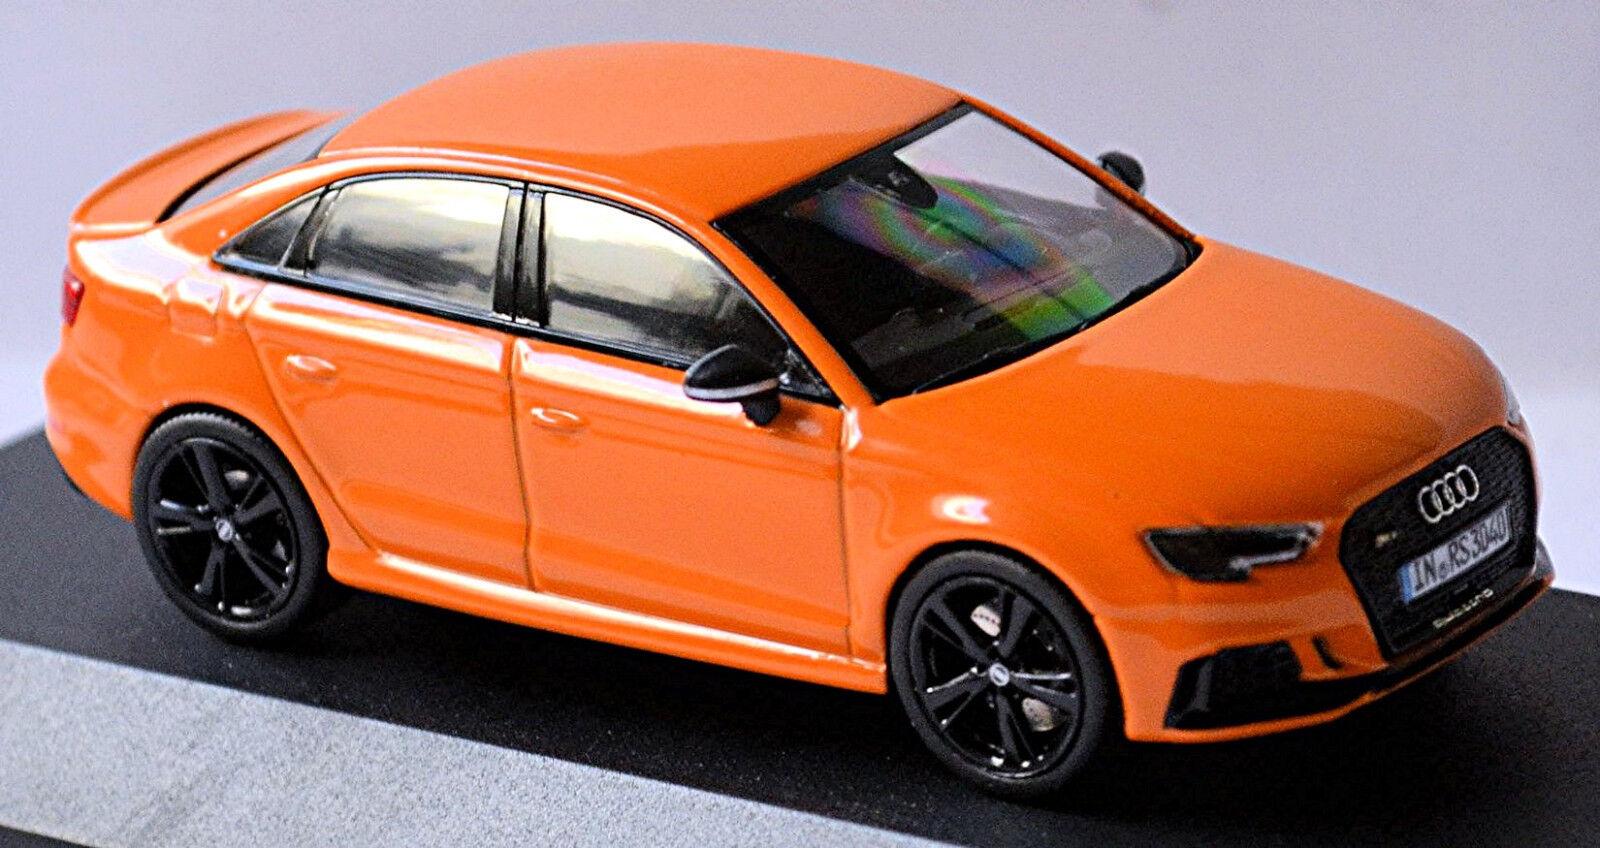 Solar Orange Audi RS 3 sedan 1:43 5011613132 *ONE LEFT SCRUFFY BOX REDUCED*